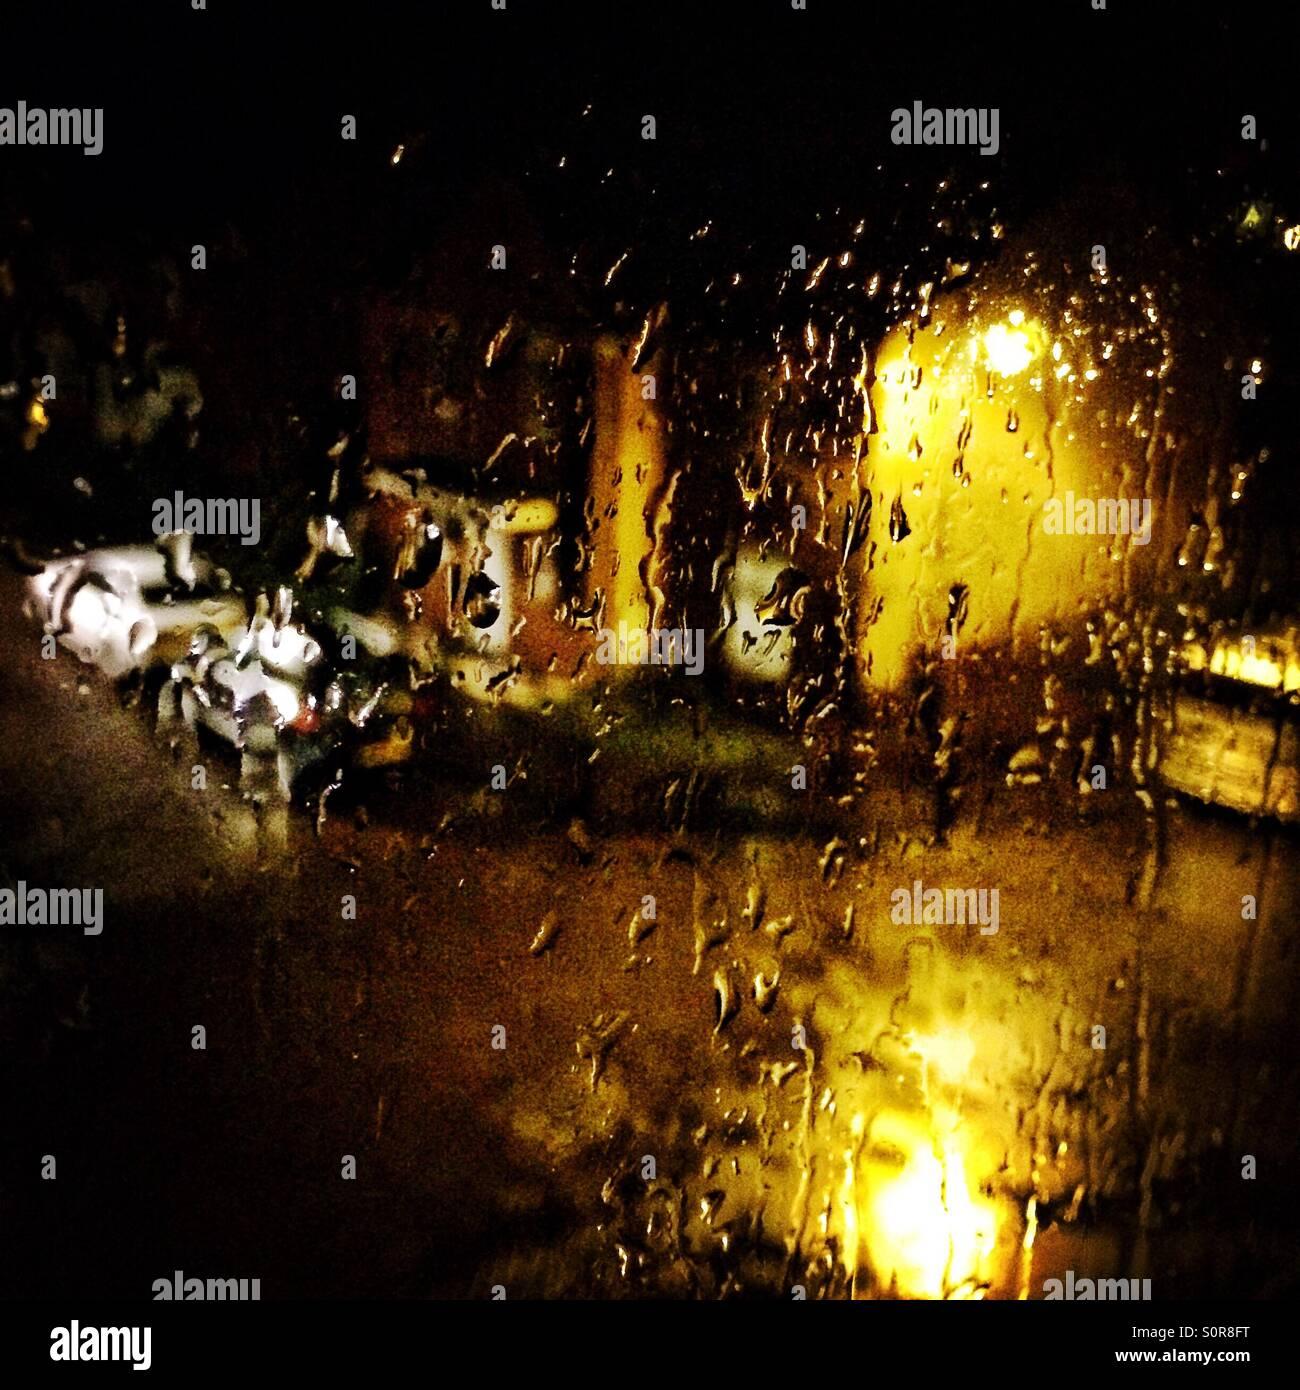 View Outside Window On A Dark Rainy Night